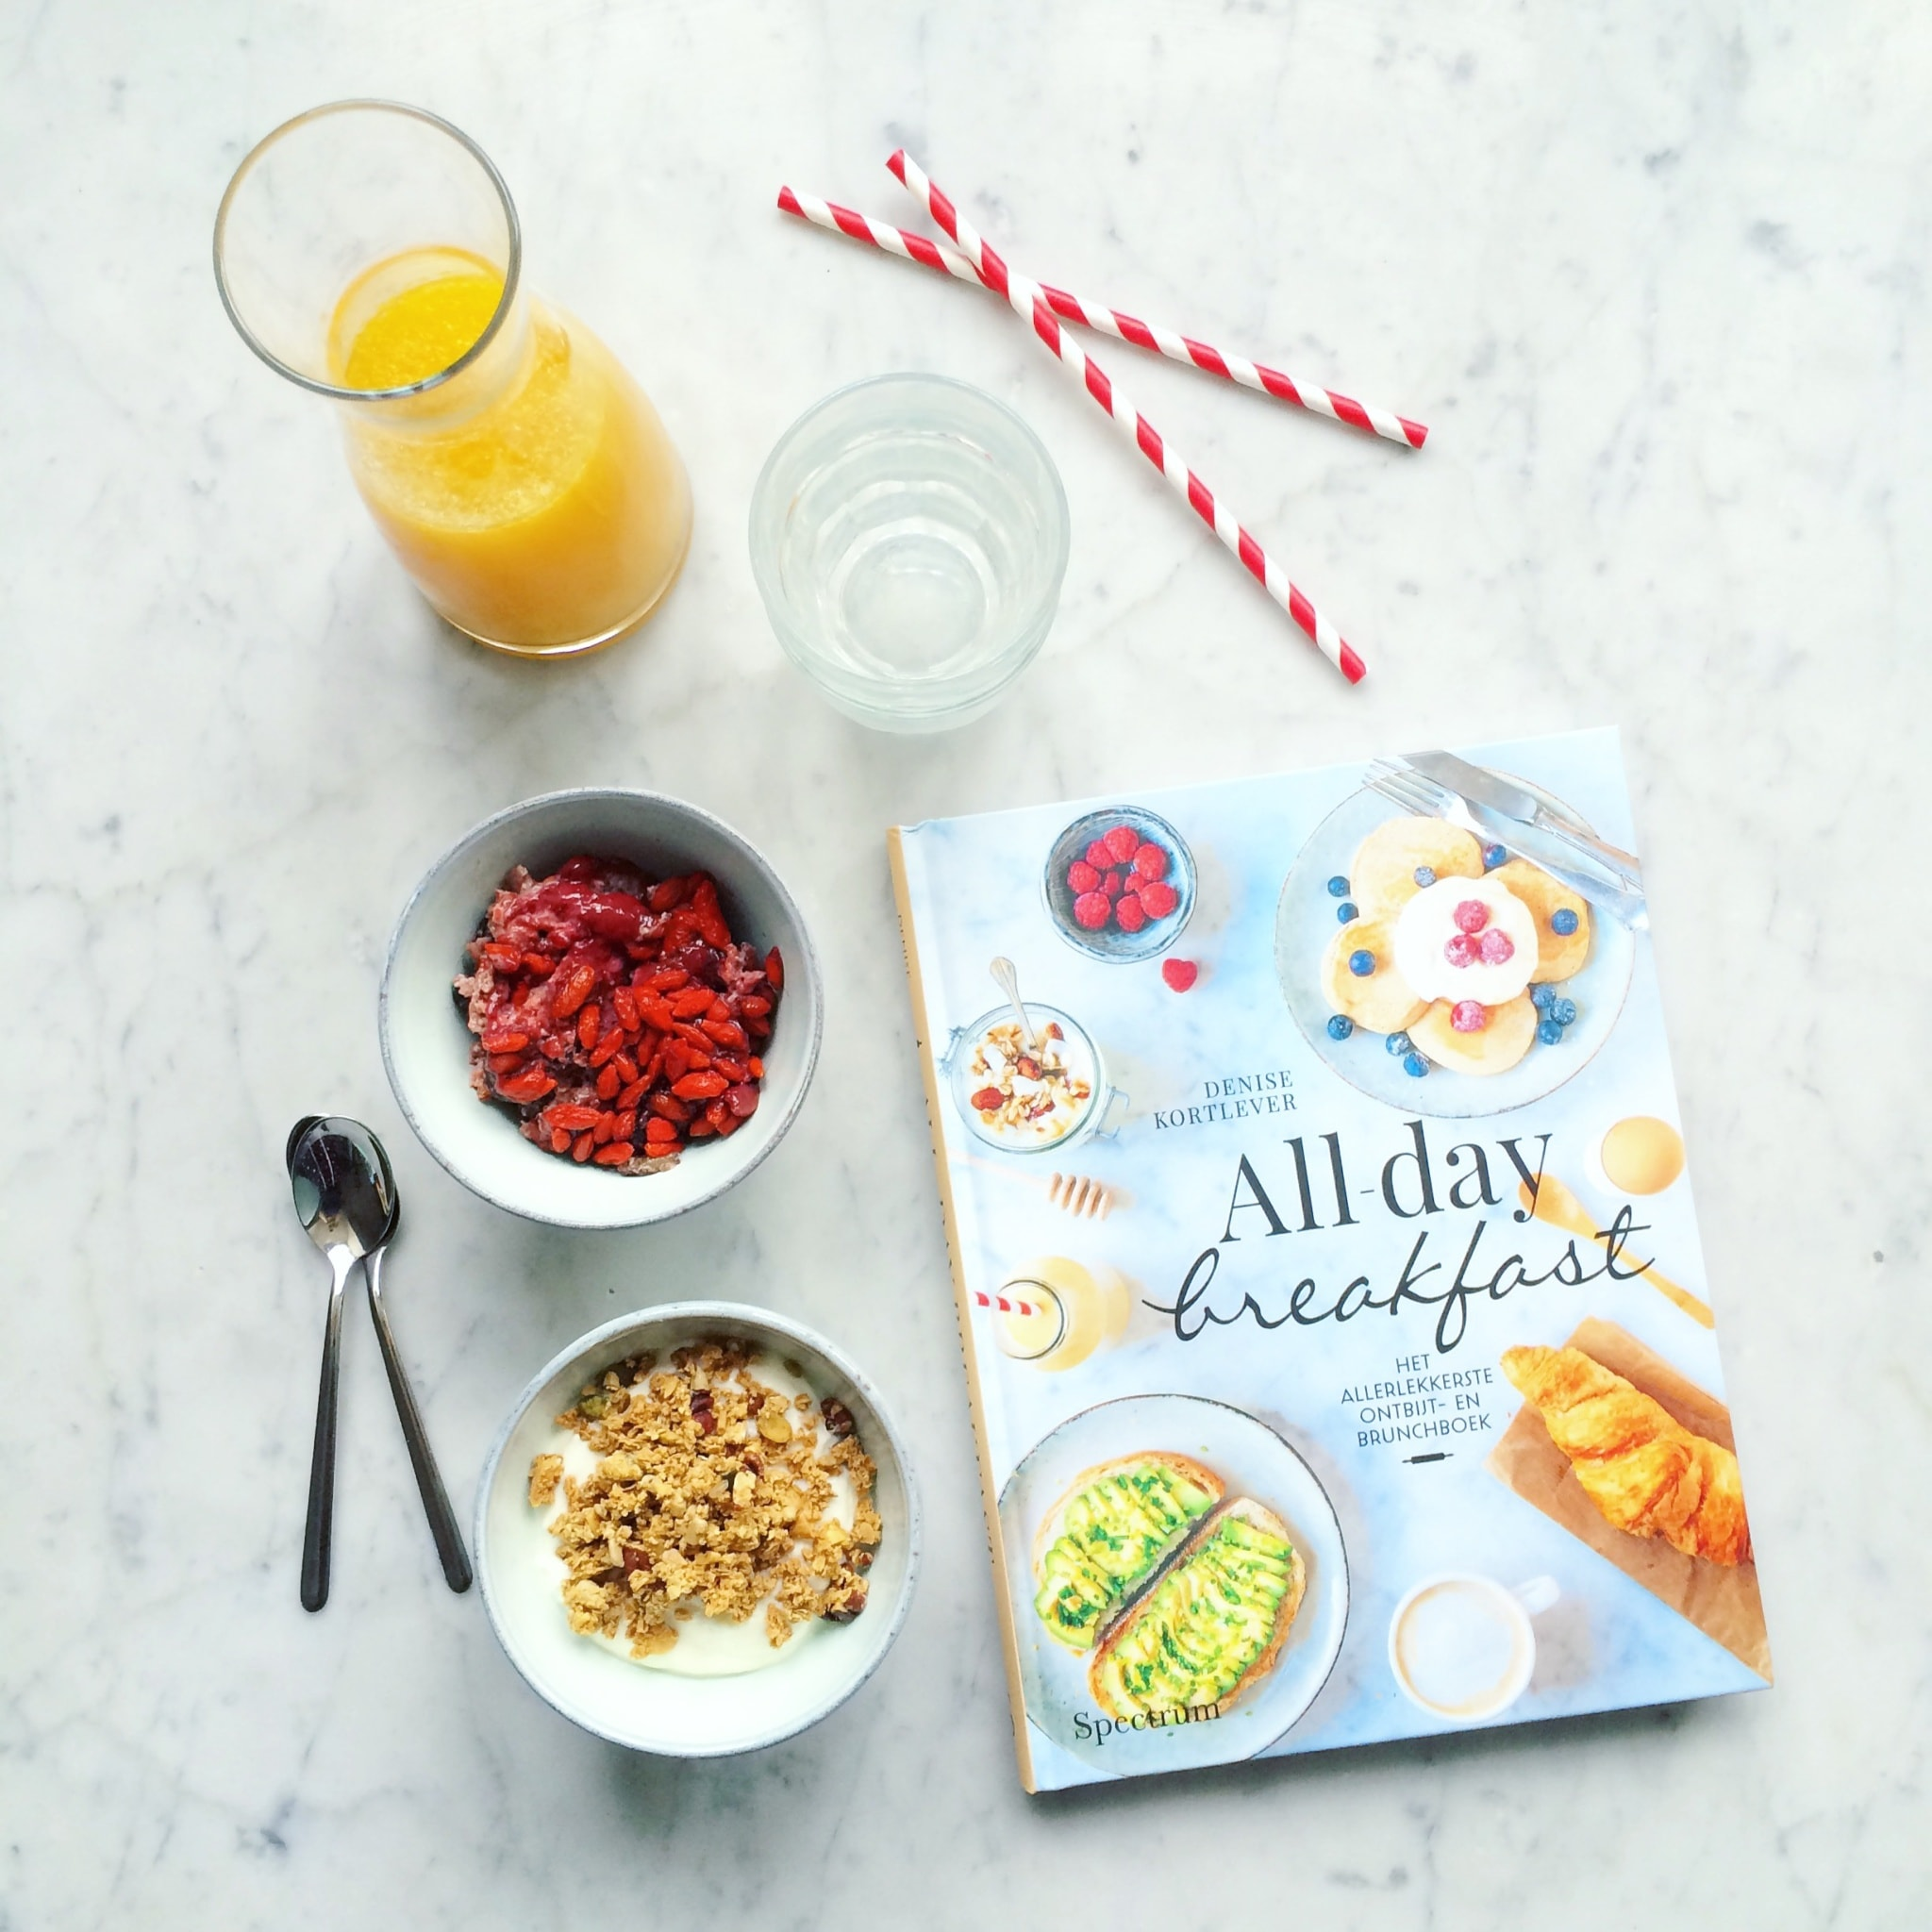 IMG 2135 - Kookboek All Day Breakfast + mini interview